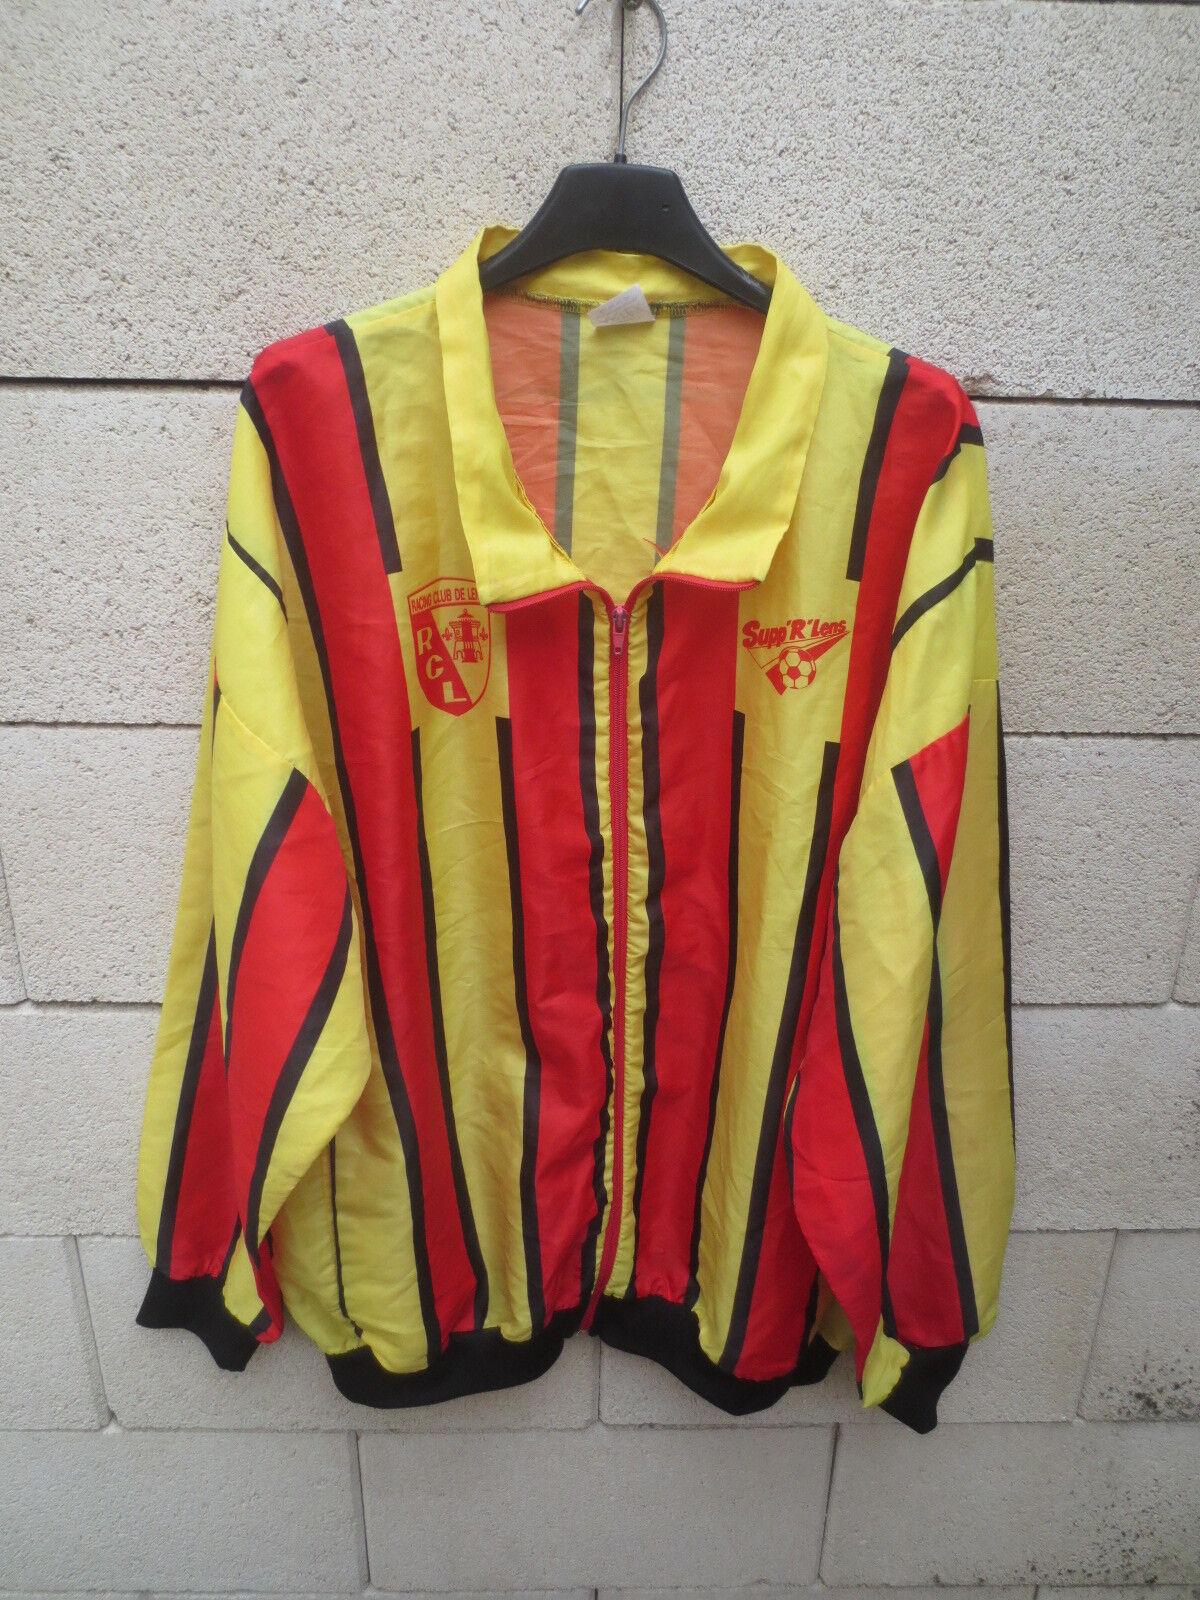 Veste SUPP'R'LENS Supporters Lens football vintage collection jacket sang or XL